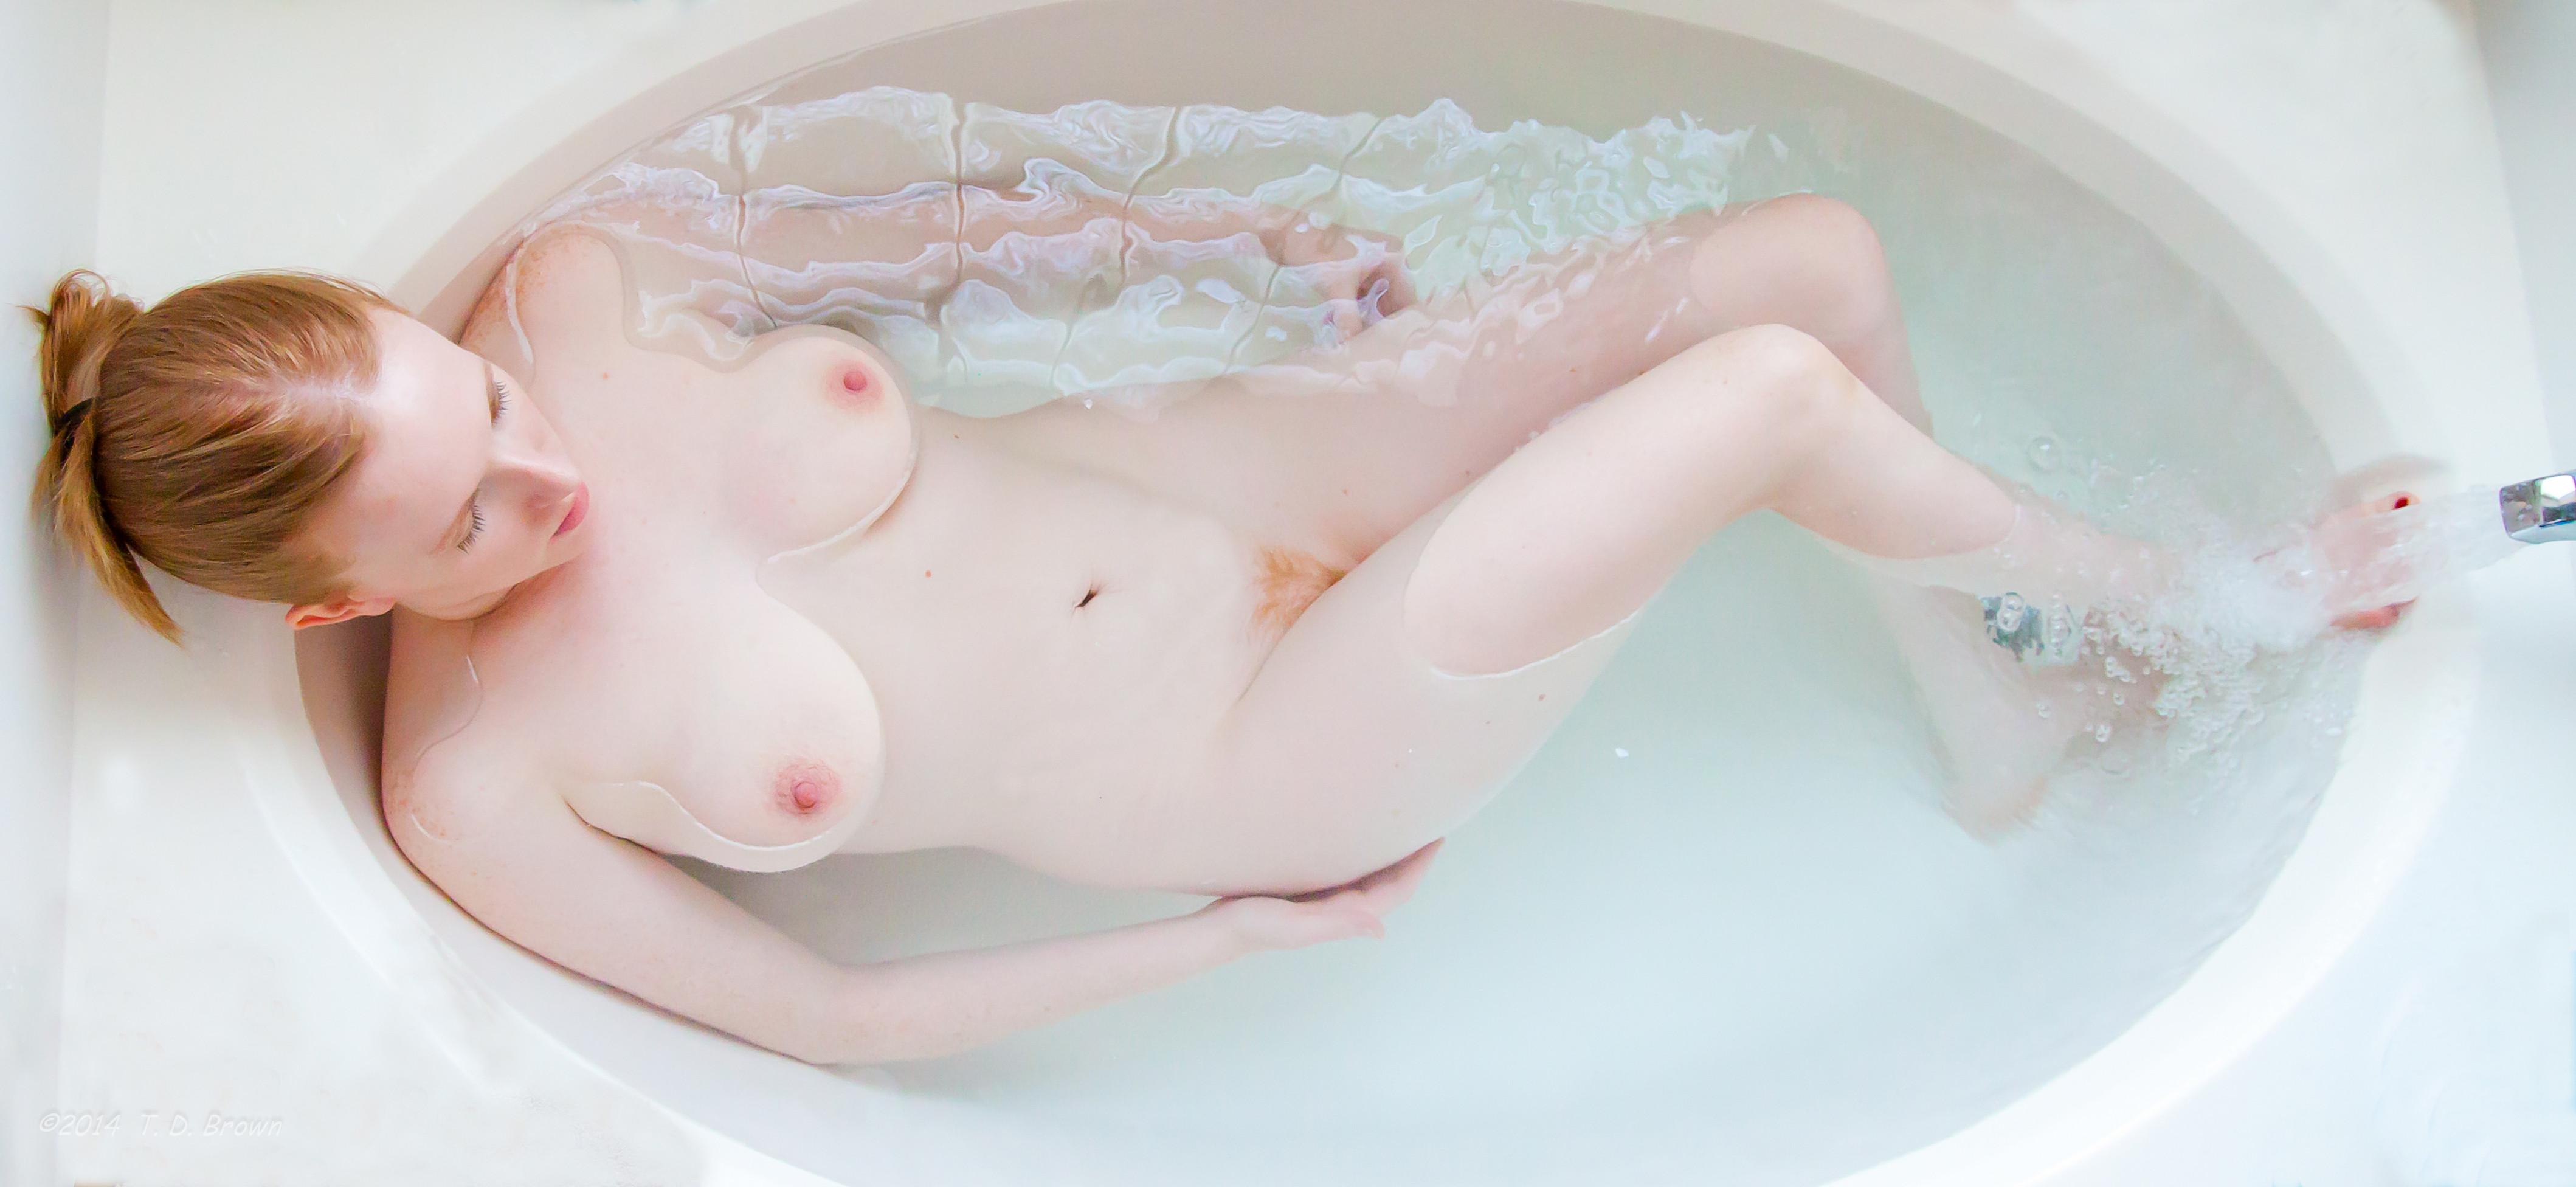 Sexy white girl naked bathroom